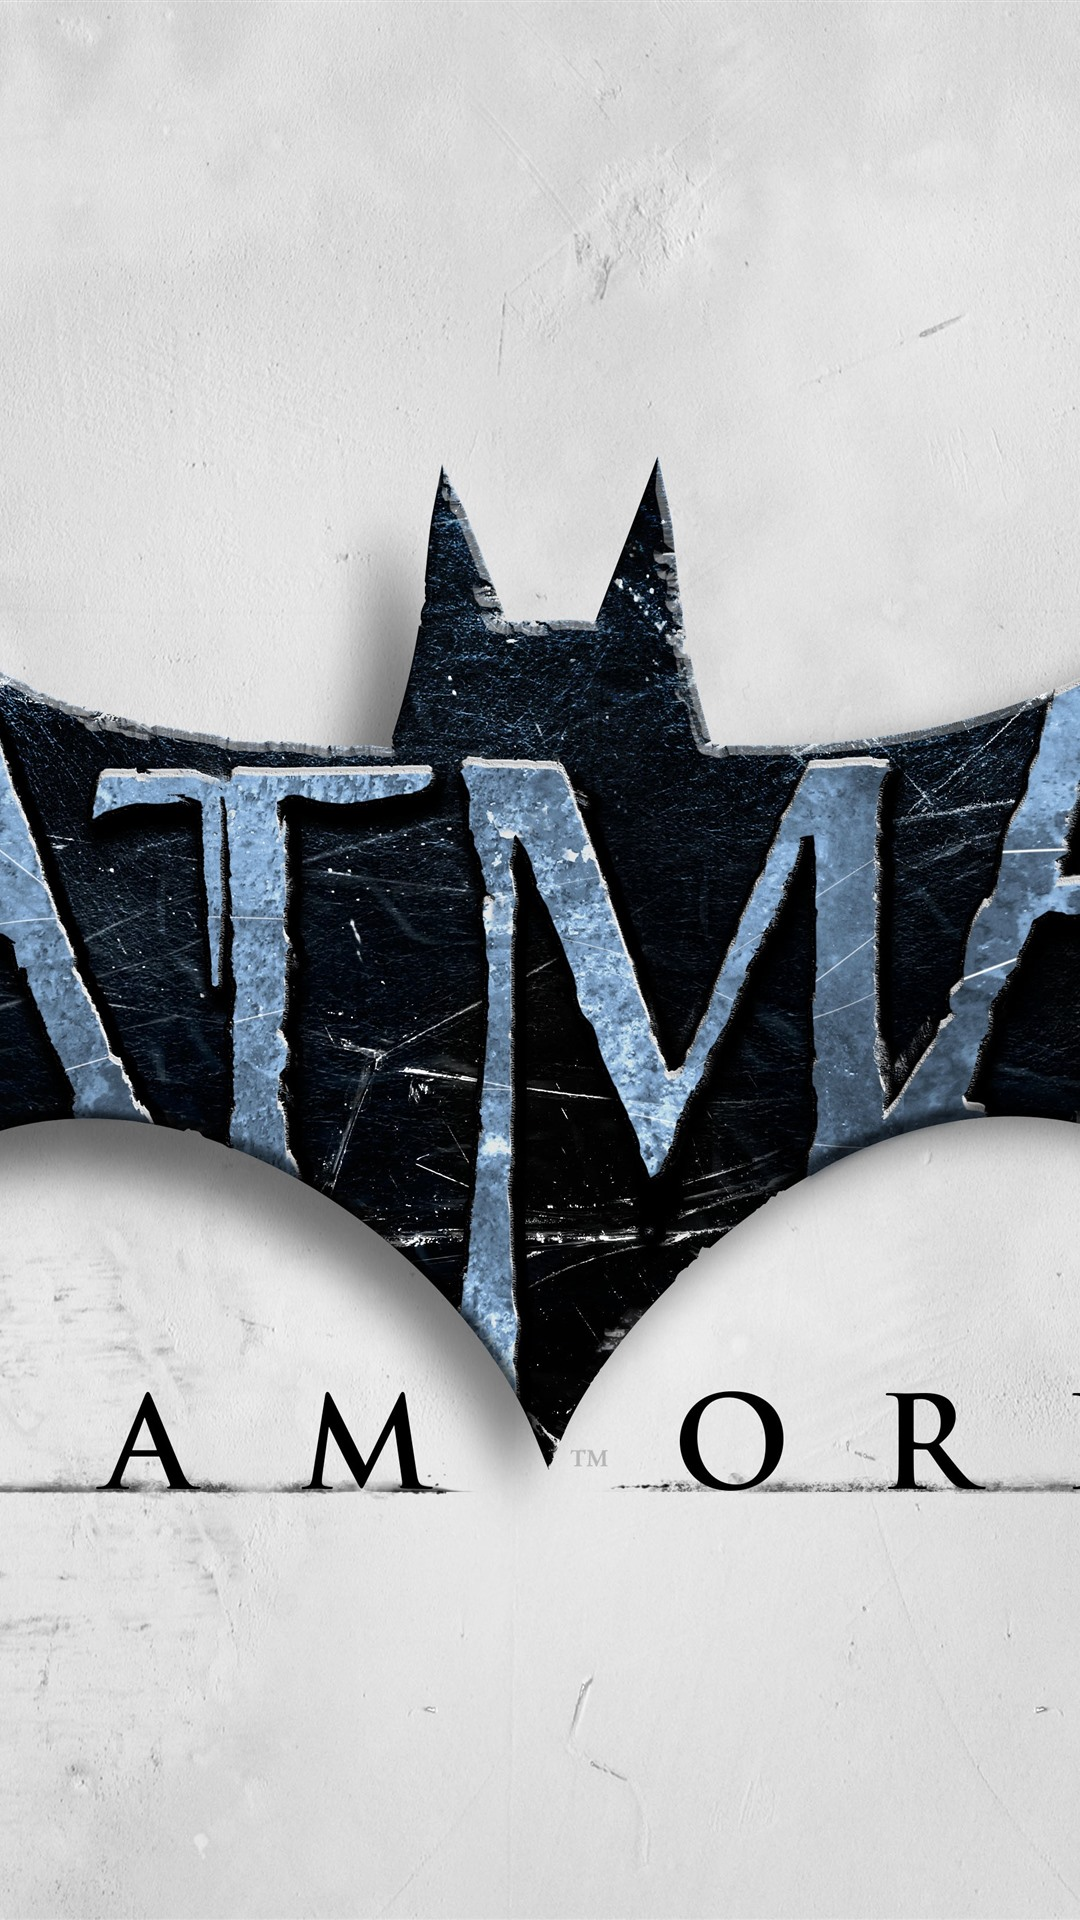 Batman Logo 1242x2688 Iphone 11 Pro Xs Max Wallpaper Background